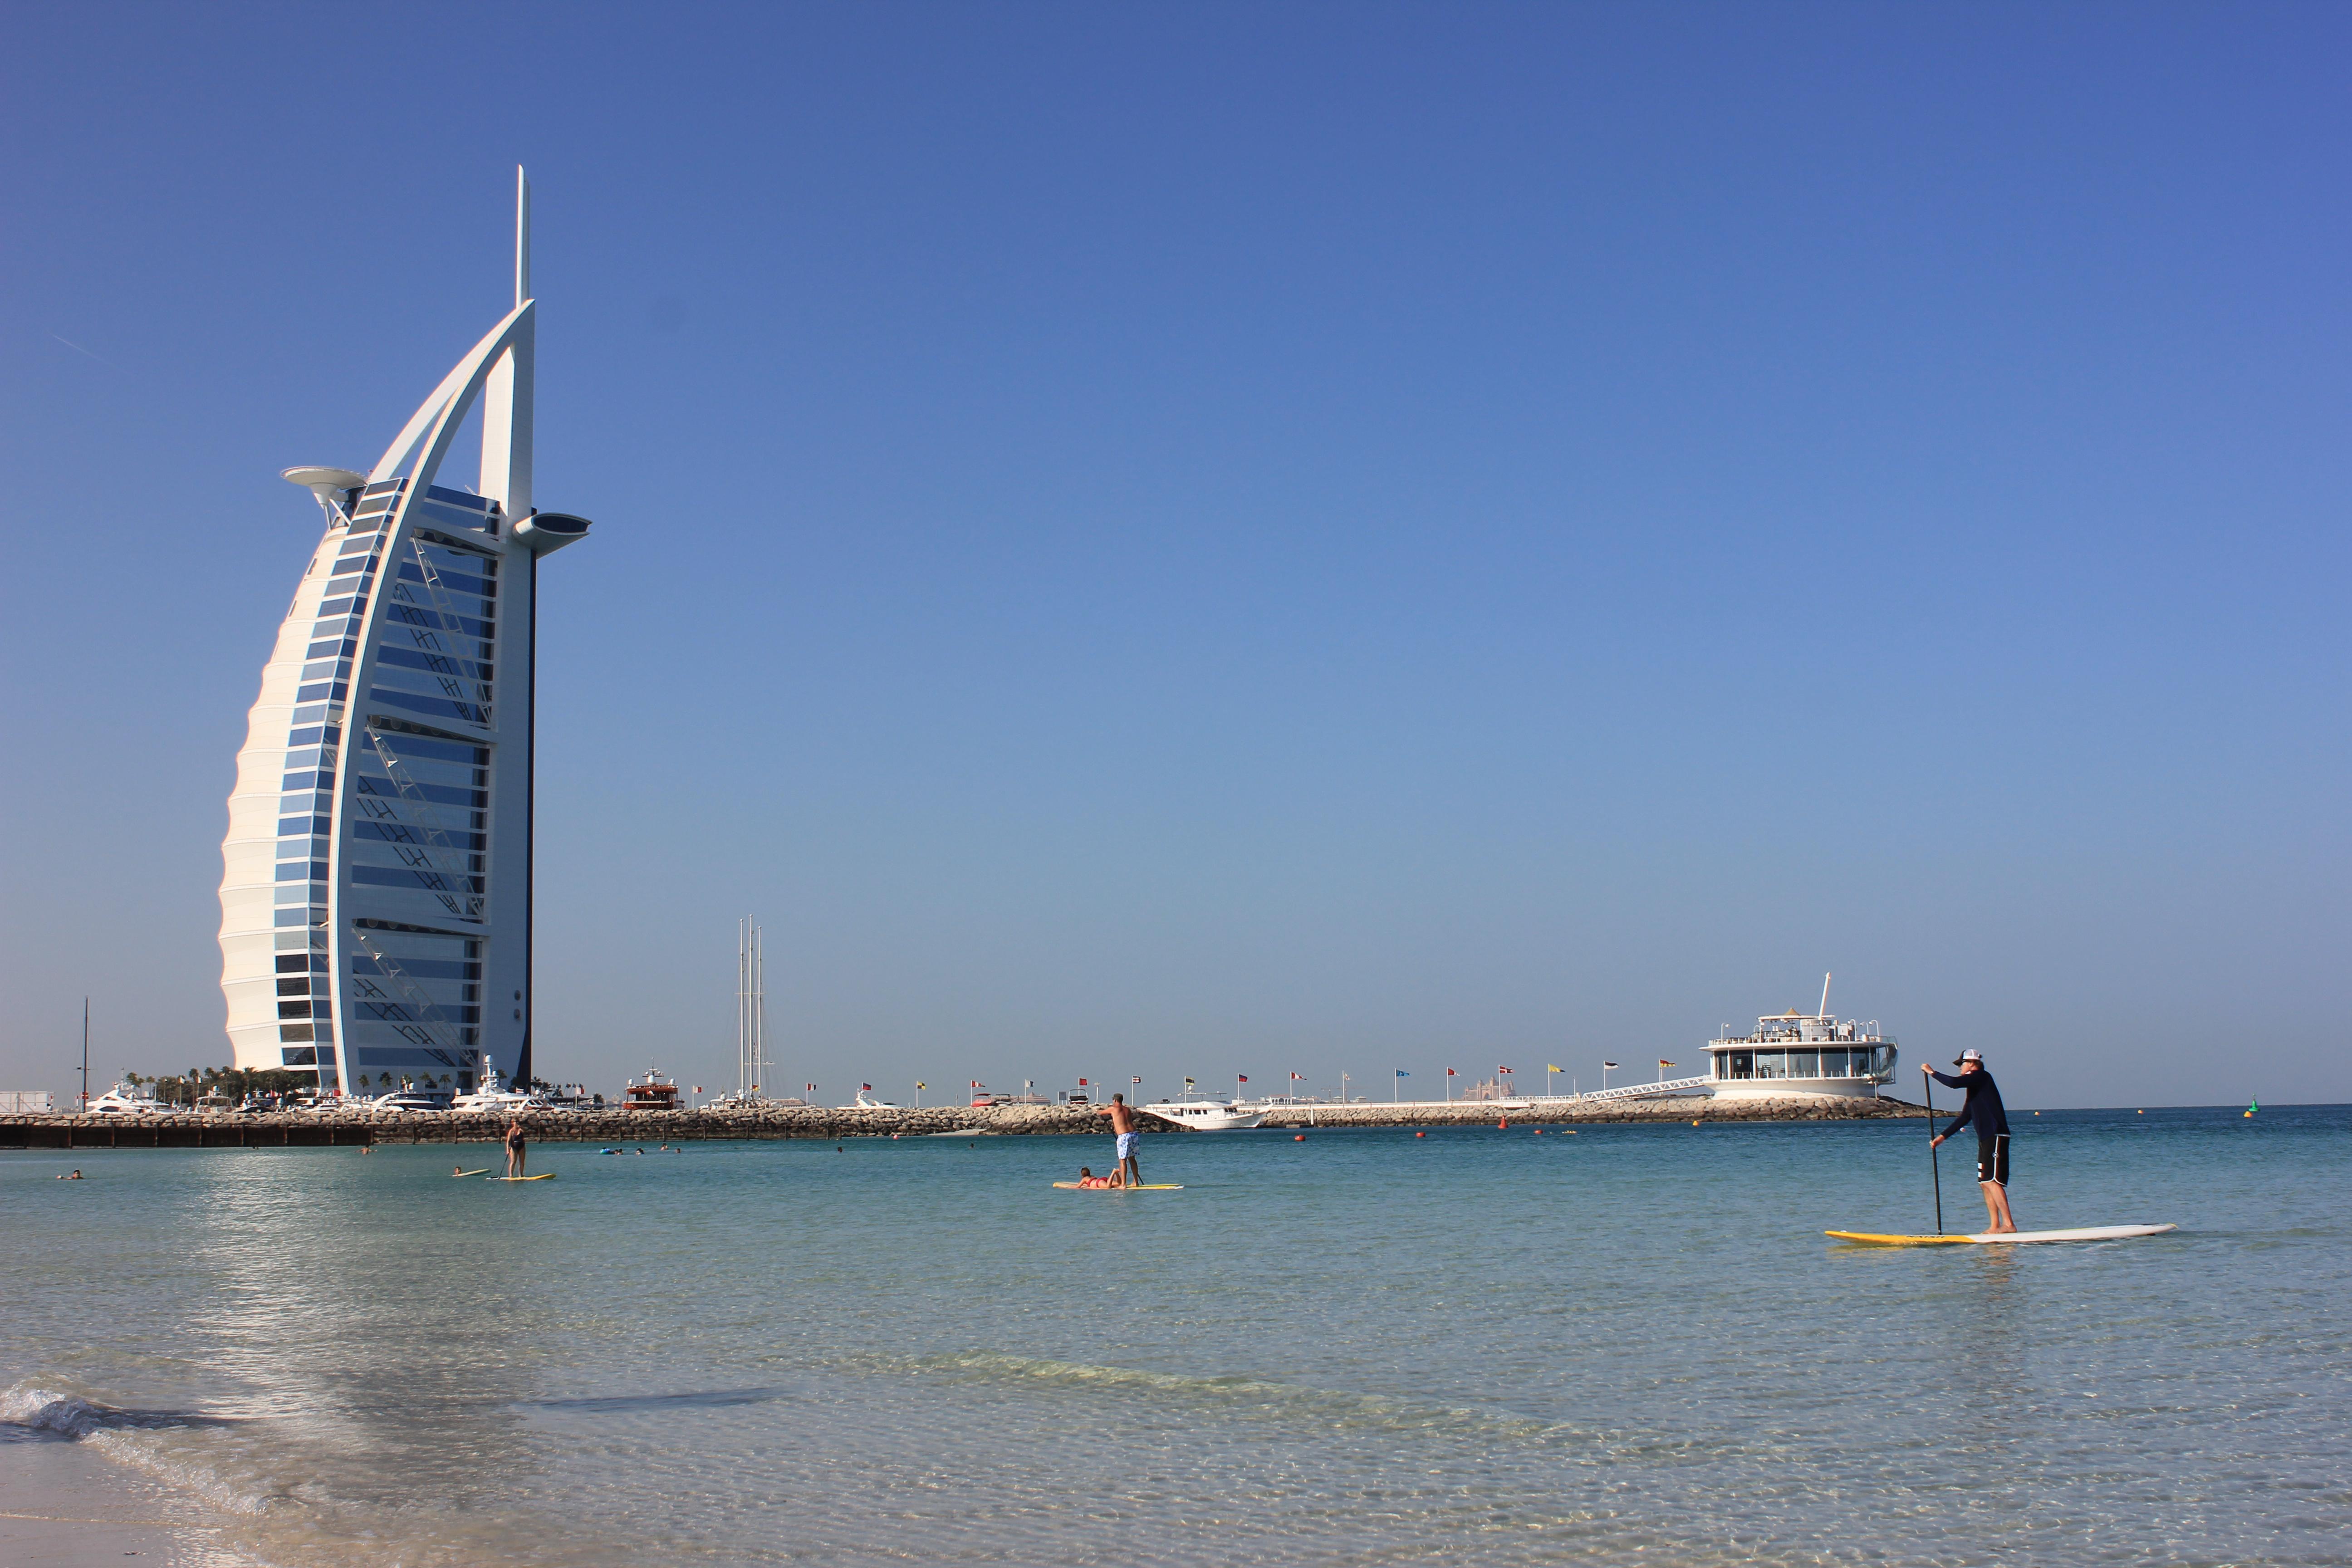 burj al arab and jumeirah open beach park | andy in oman